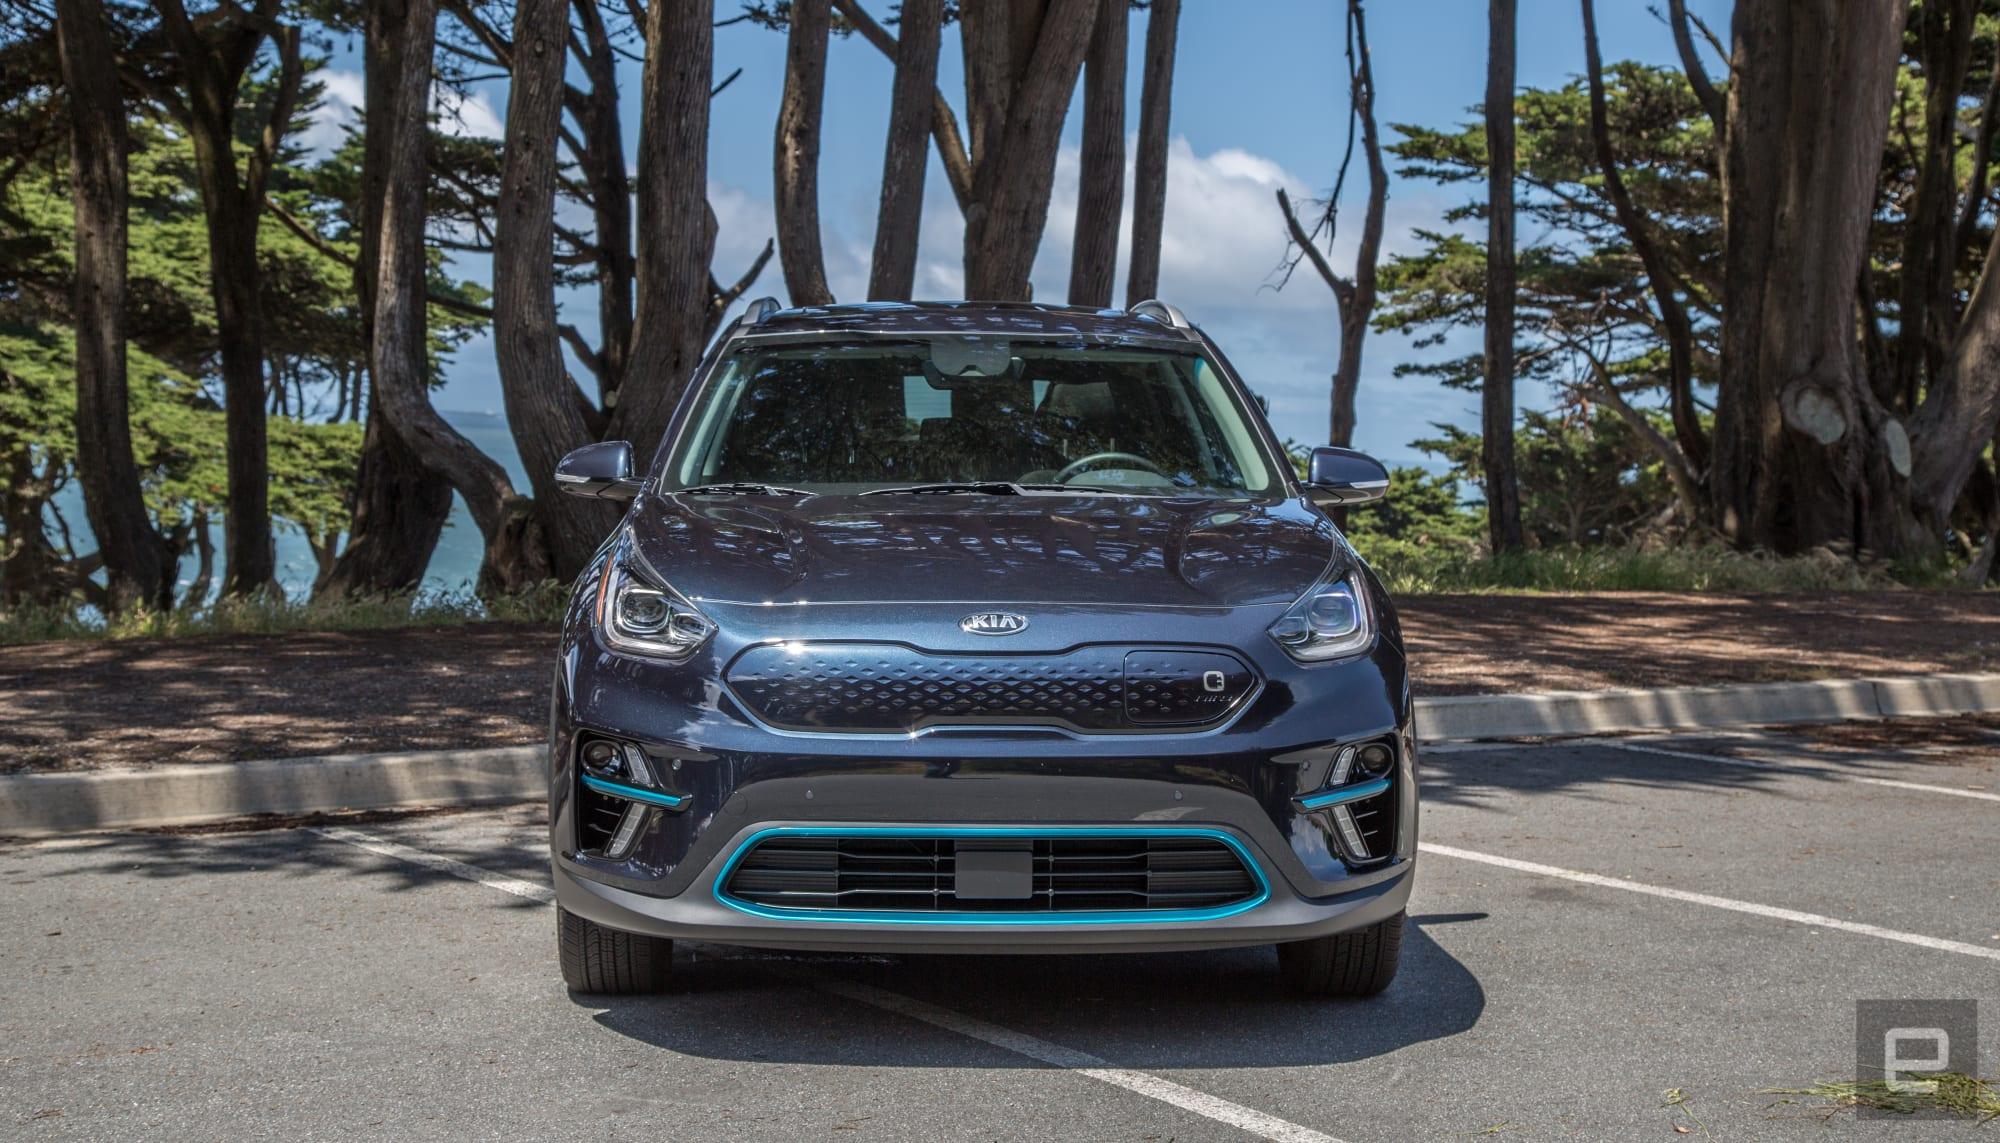 2019 Kia Niro EV-test